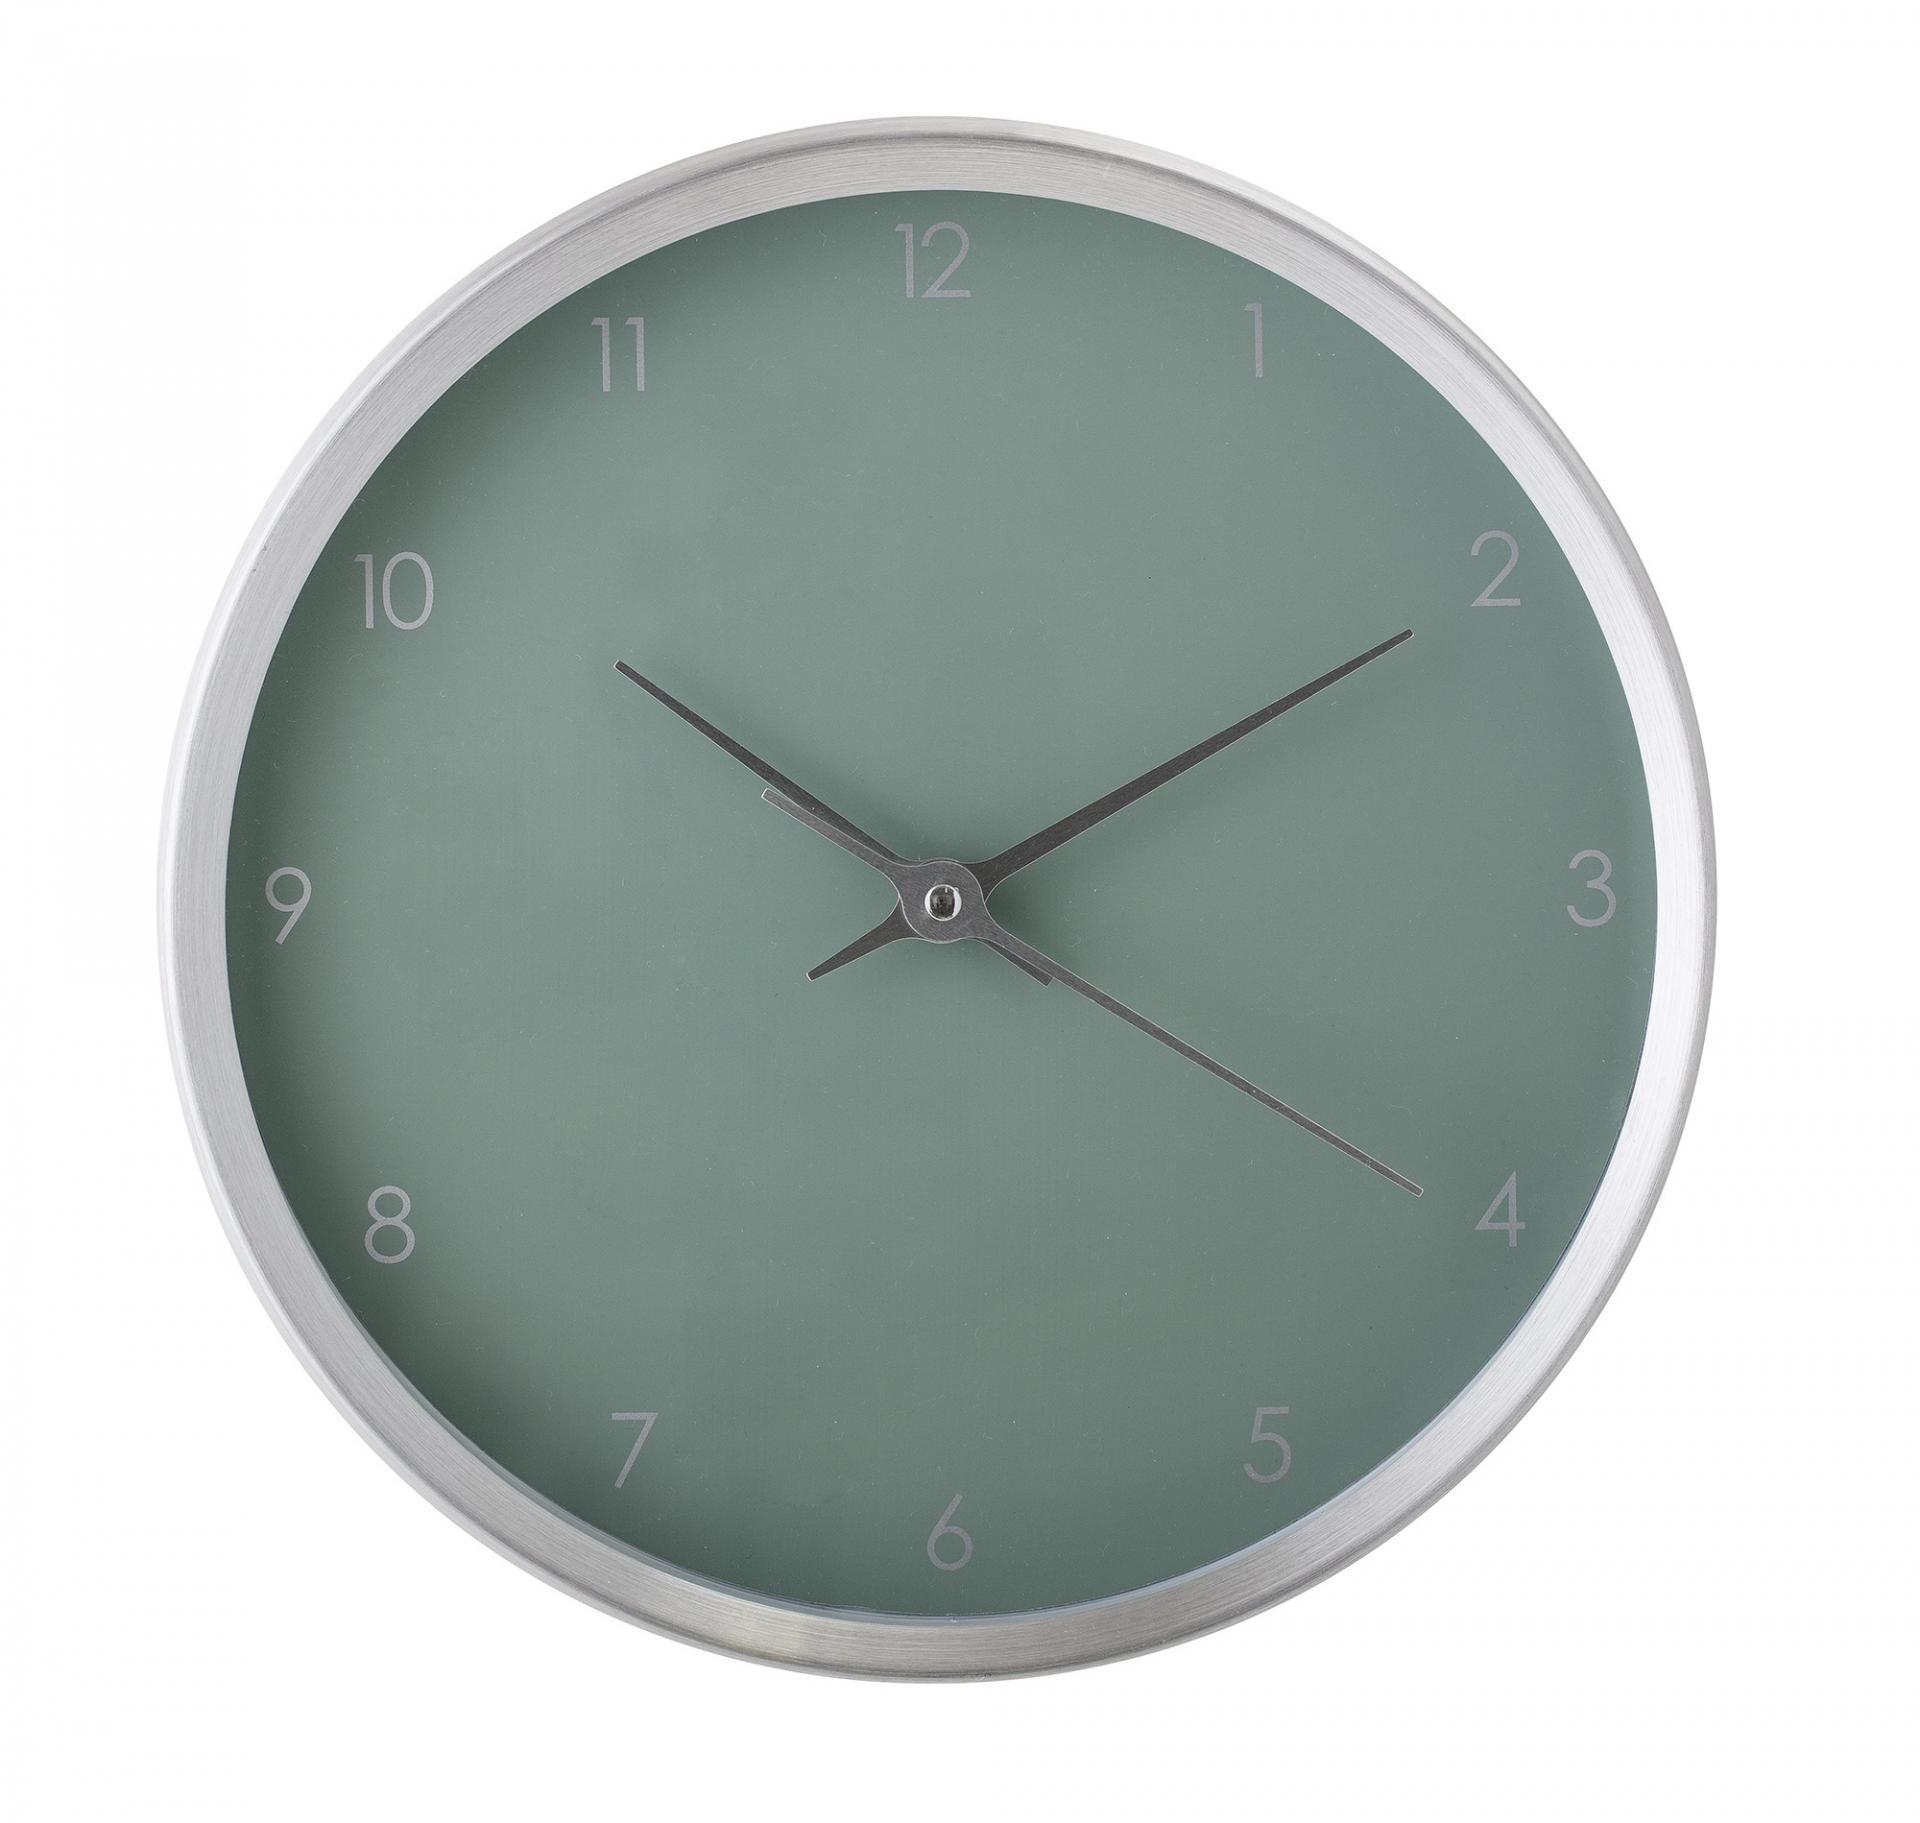 Bloomingville Nástěnné hodiny Aluminium Green, zelená barva, šedá barva, stříbrná barva, sk